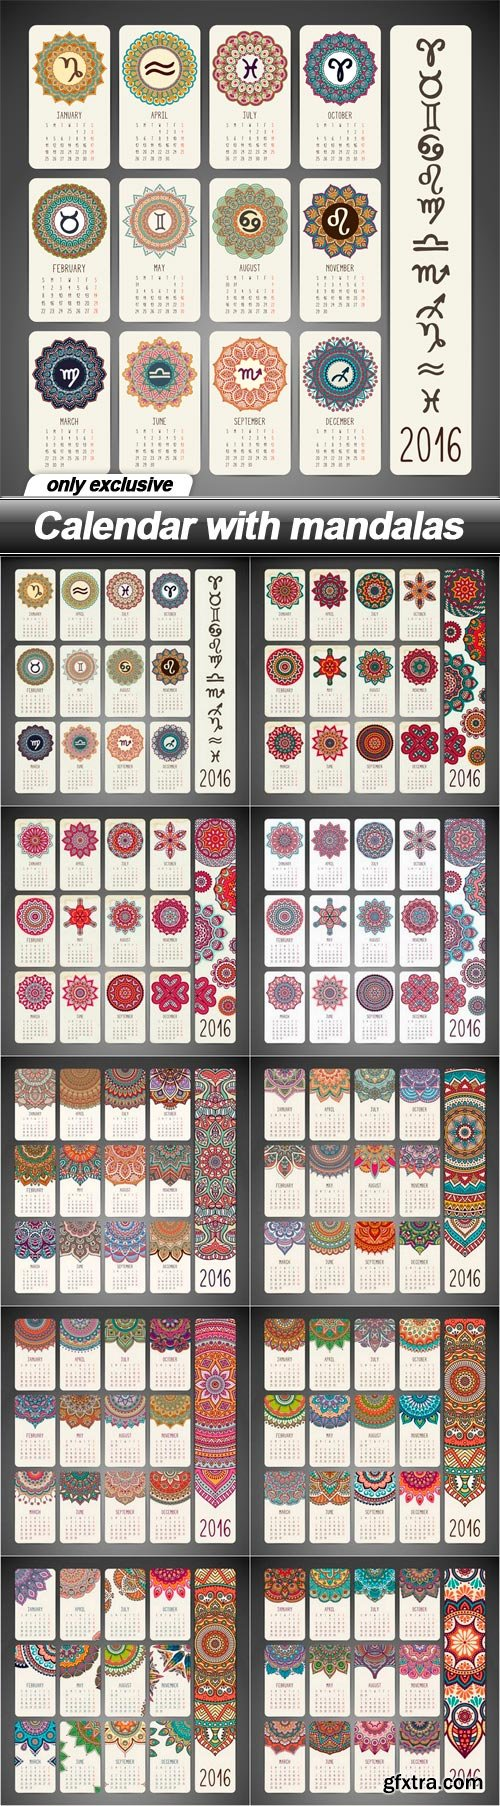 Calendar with mandalas - 10 EPS